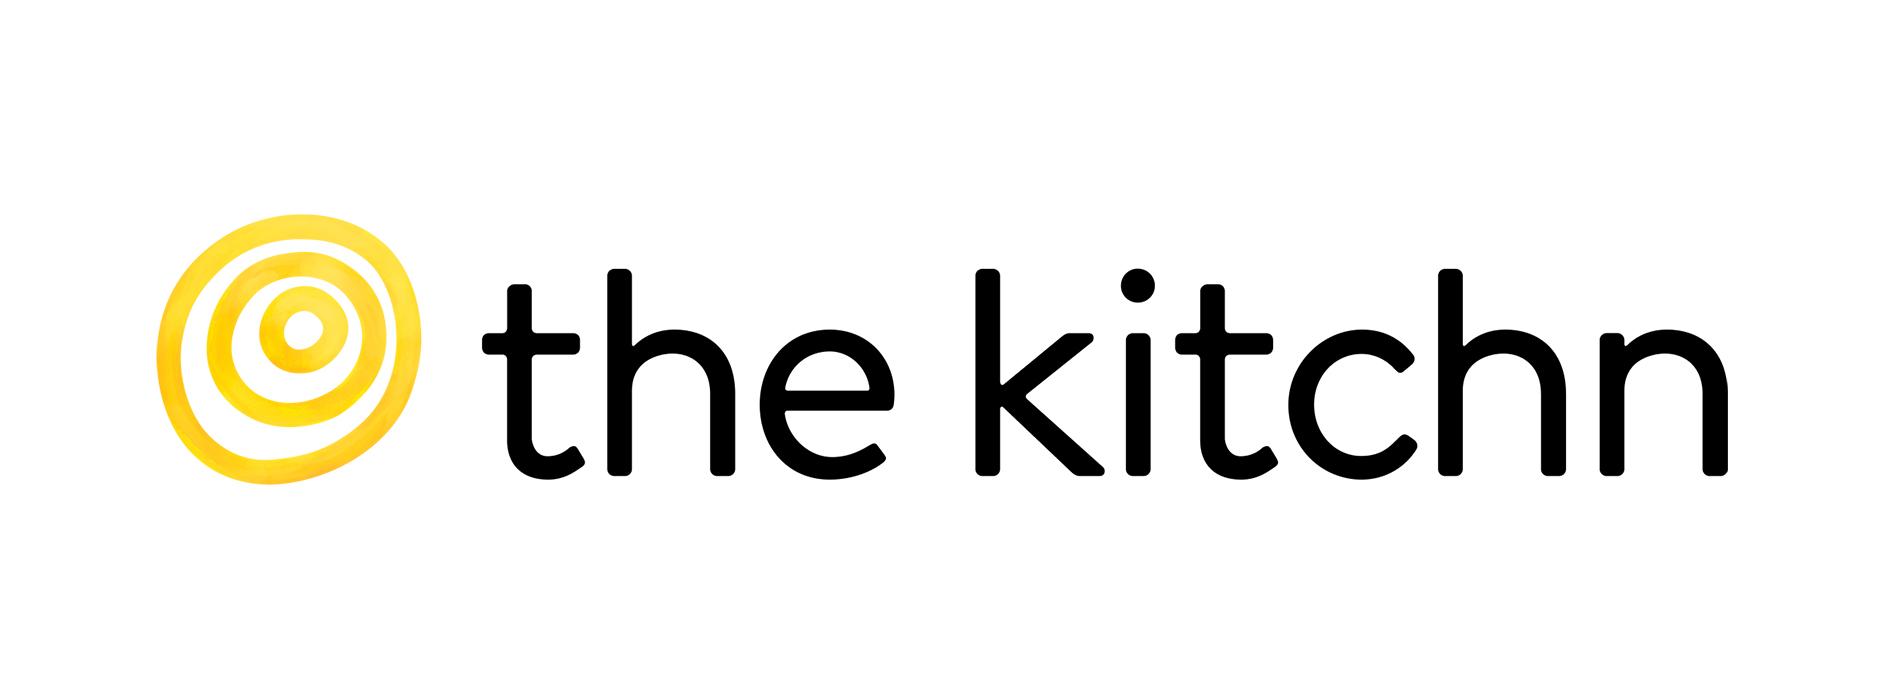 the kitchn.jpg